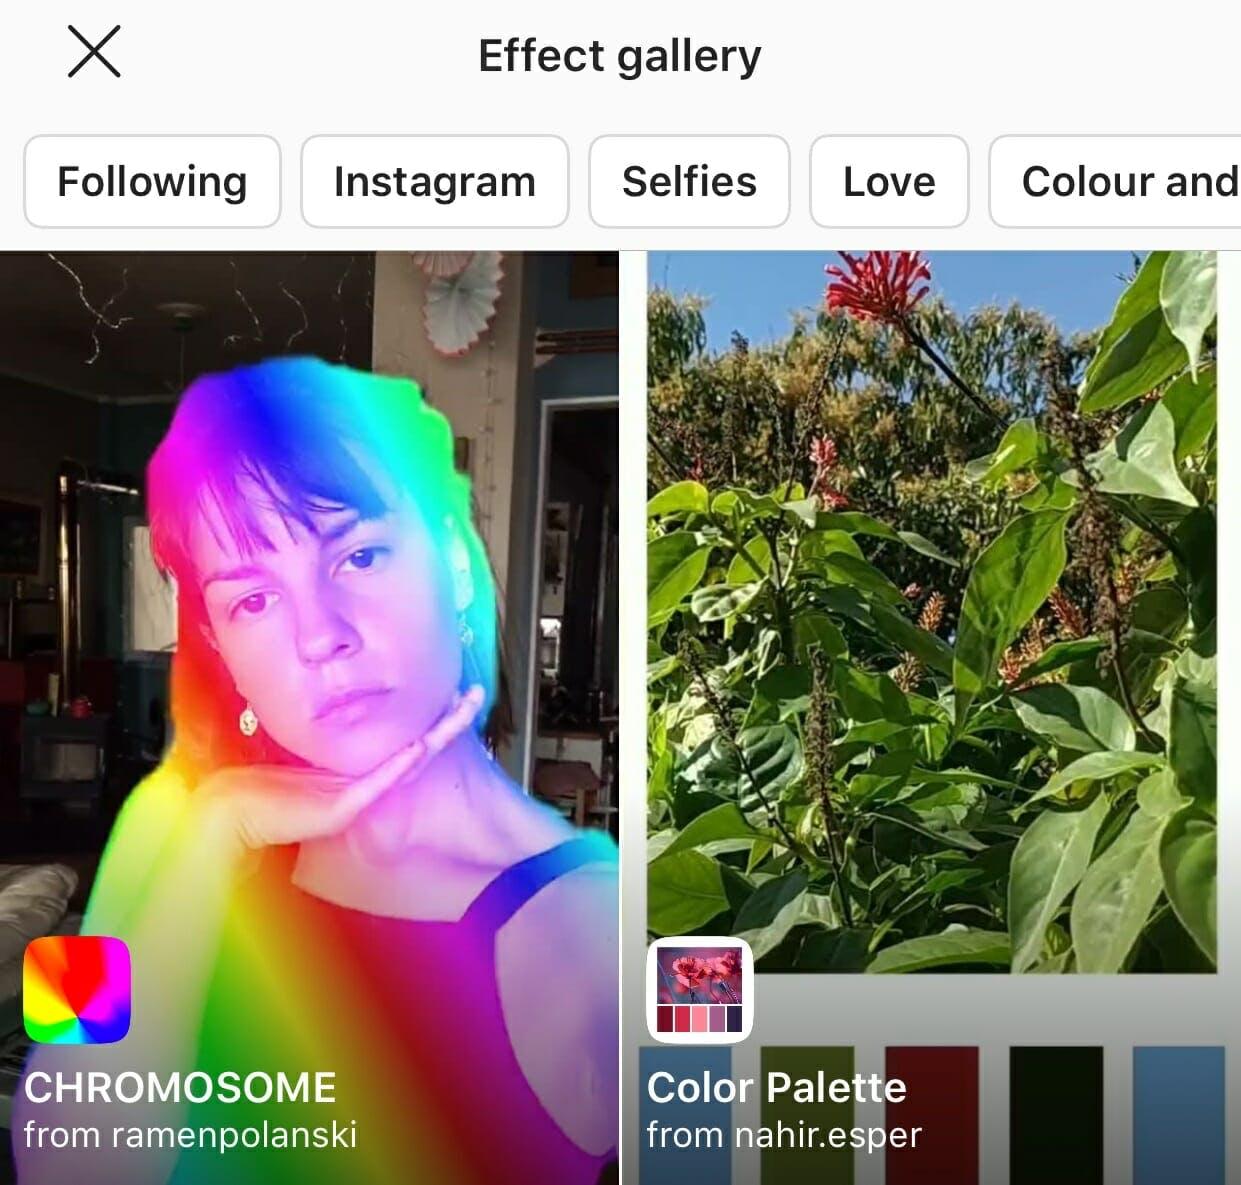 instagram effects gallery